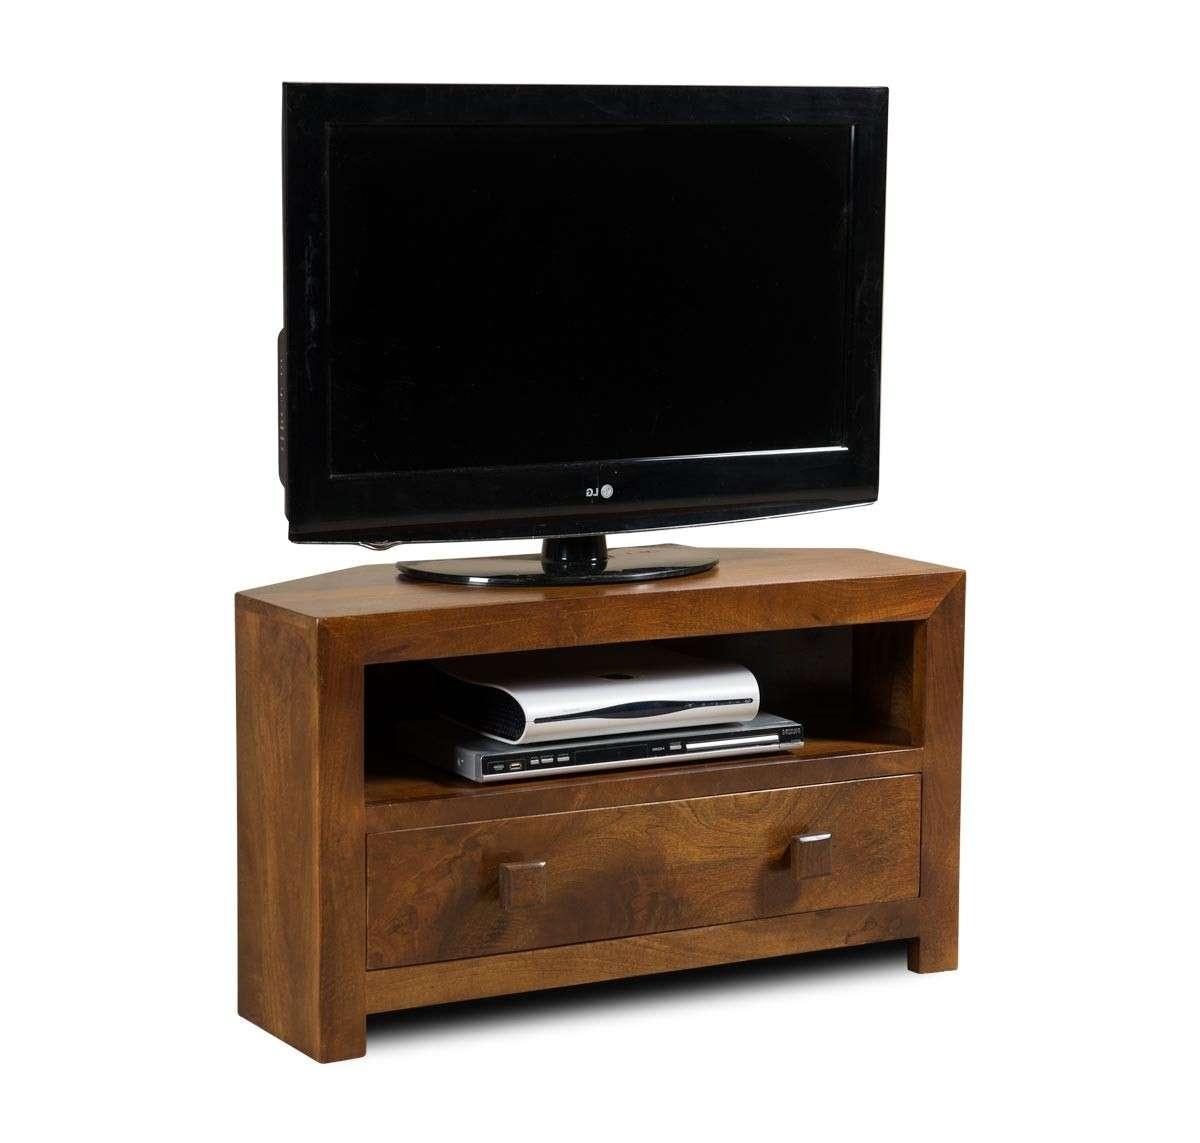 Dakota Mango Small Corner Tv Stand | Casa Bella Furniture Uk Throughout Small Corner Tv Stands (View 4 of 20)